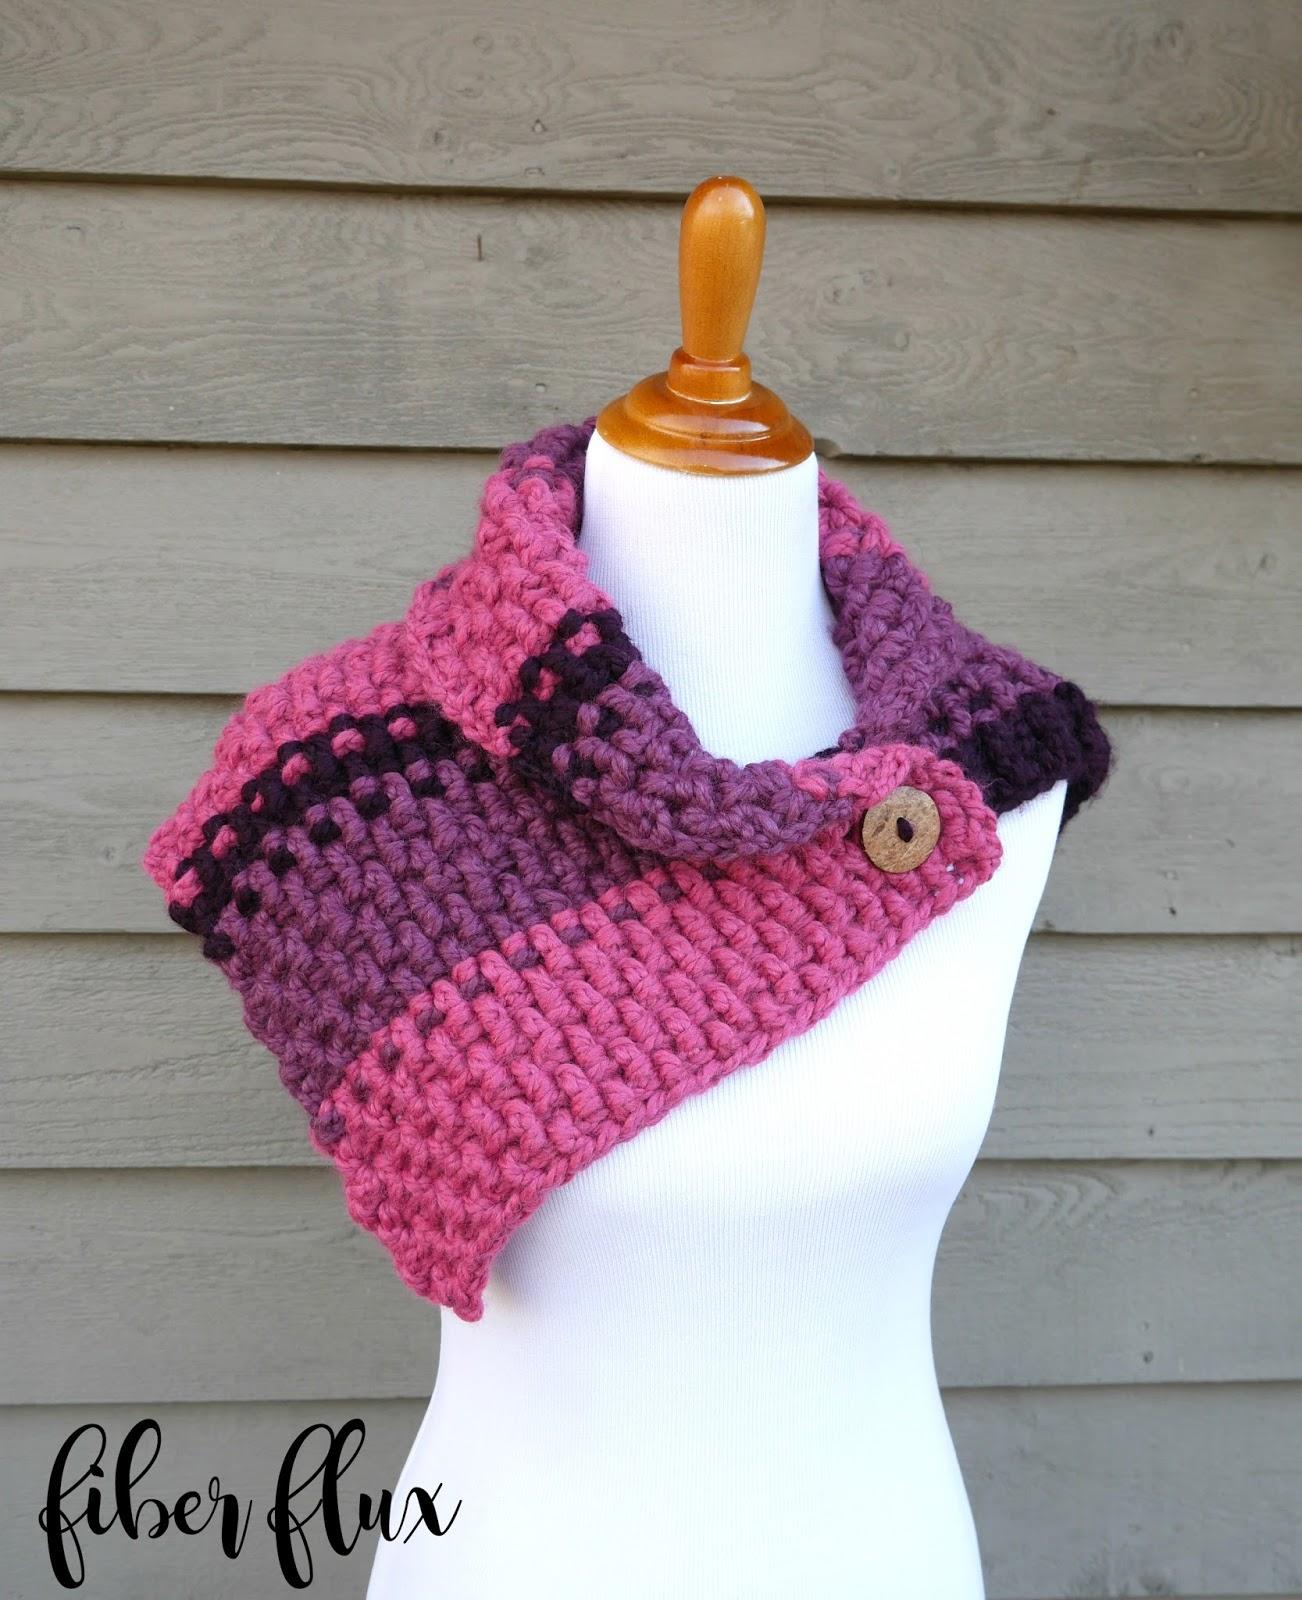 Free Crochet Patterns Button Cowl : Fiber Flux: Free Crochet Pattern...Lingonberry Button Cowl